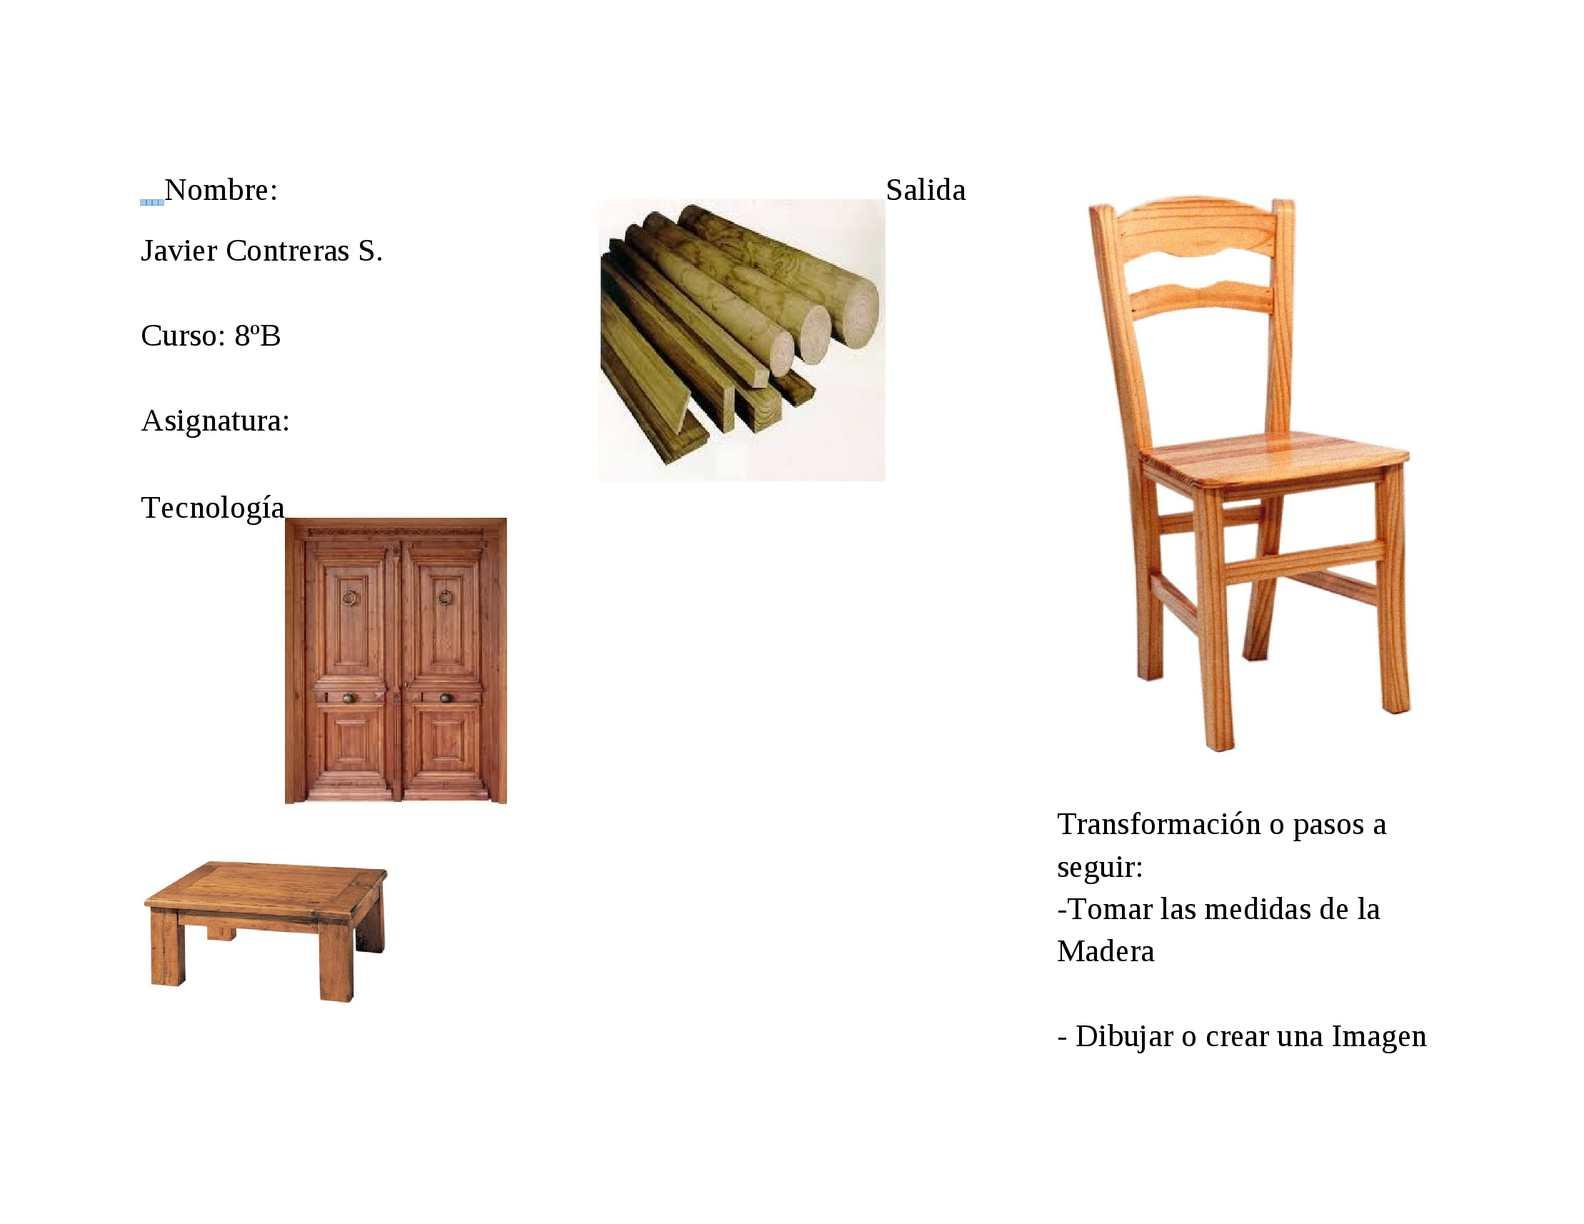 Calam o proceso productivo de la silla for Sillas para dibujar facil